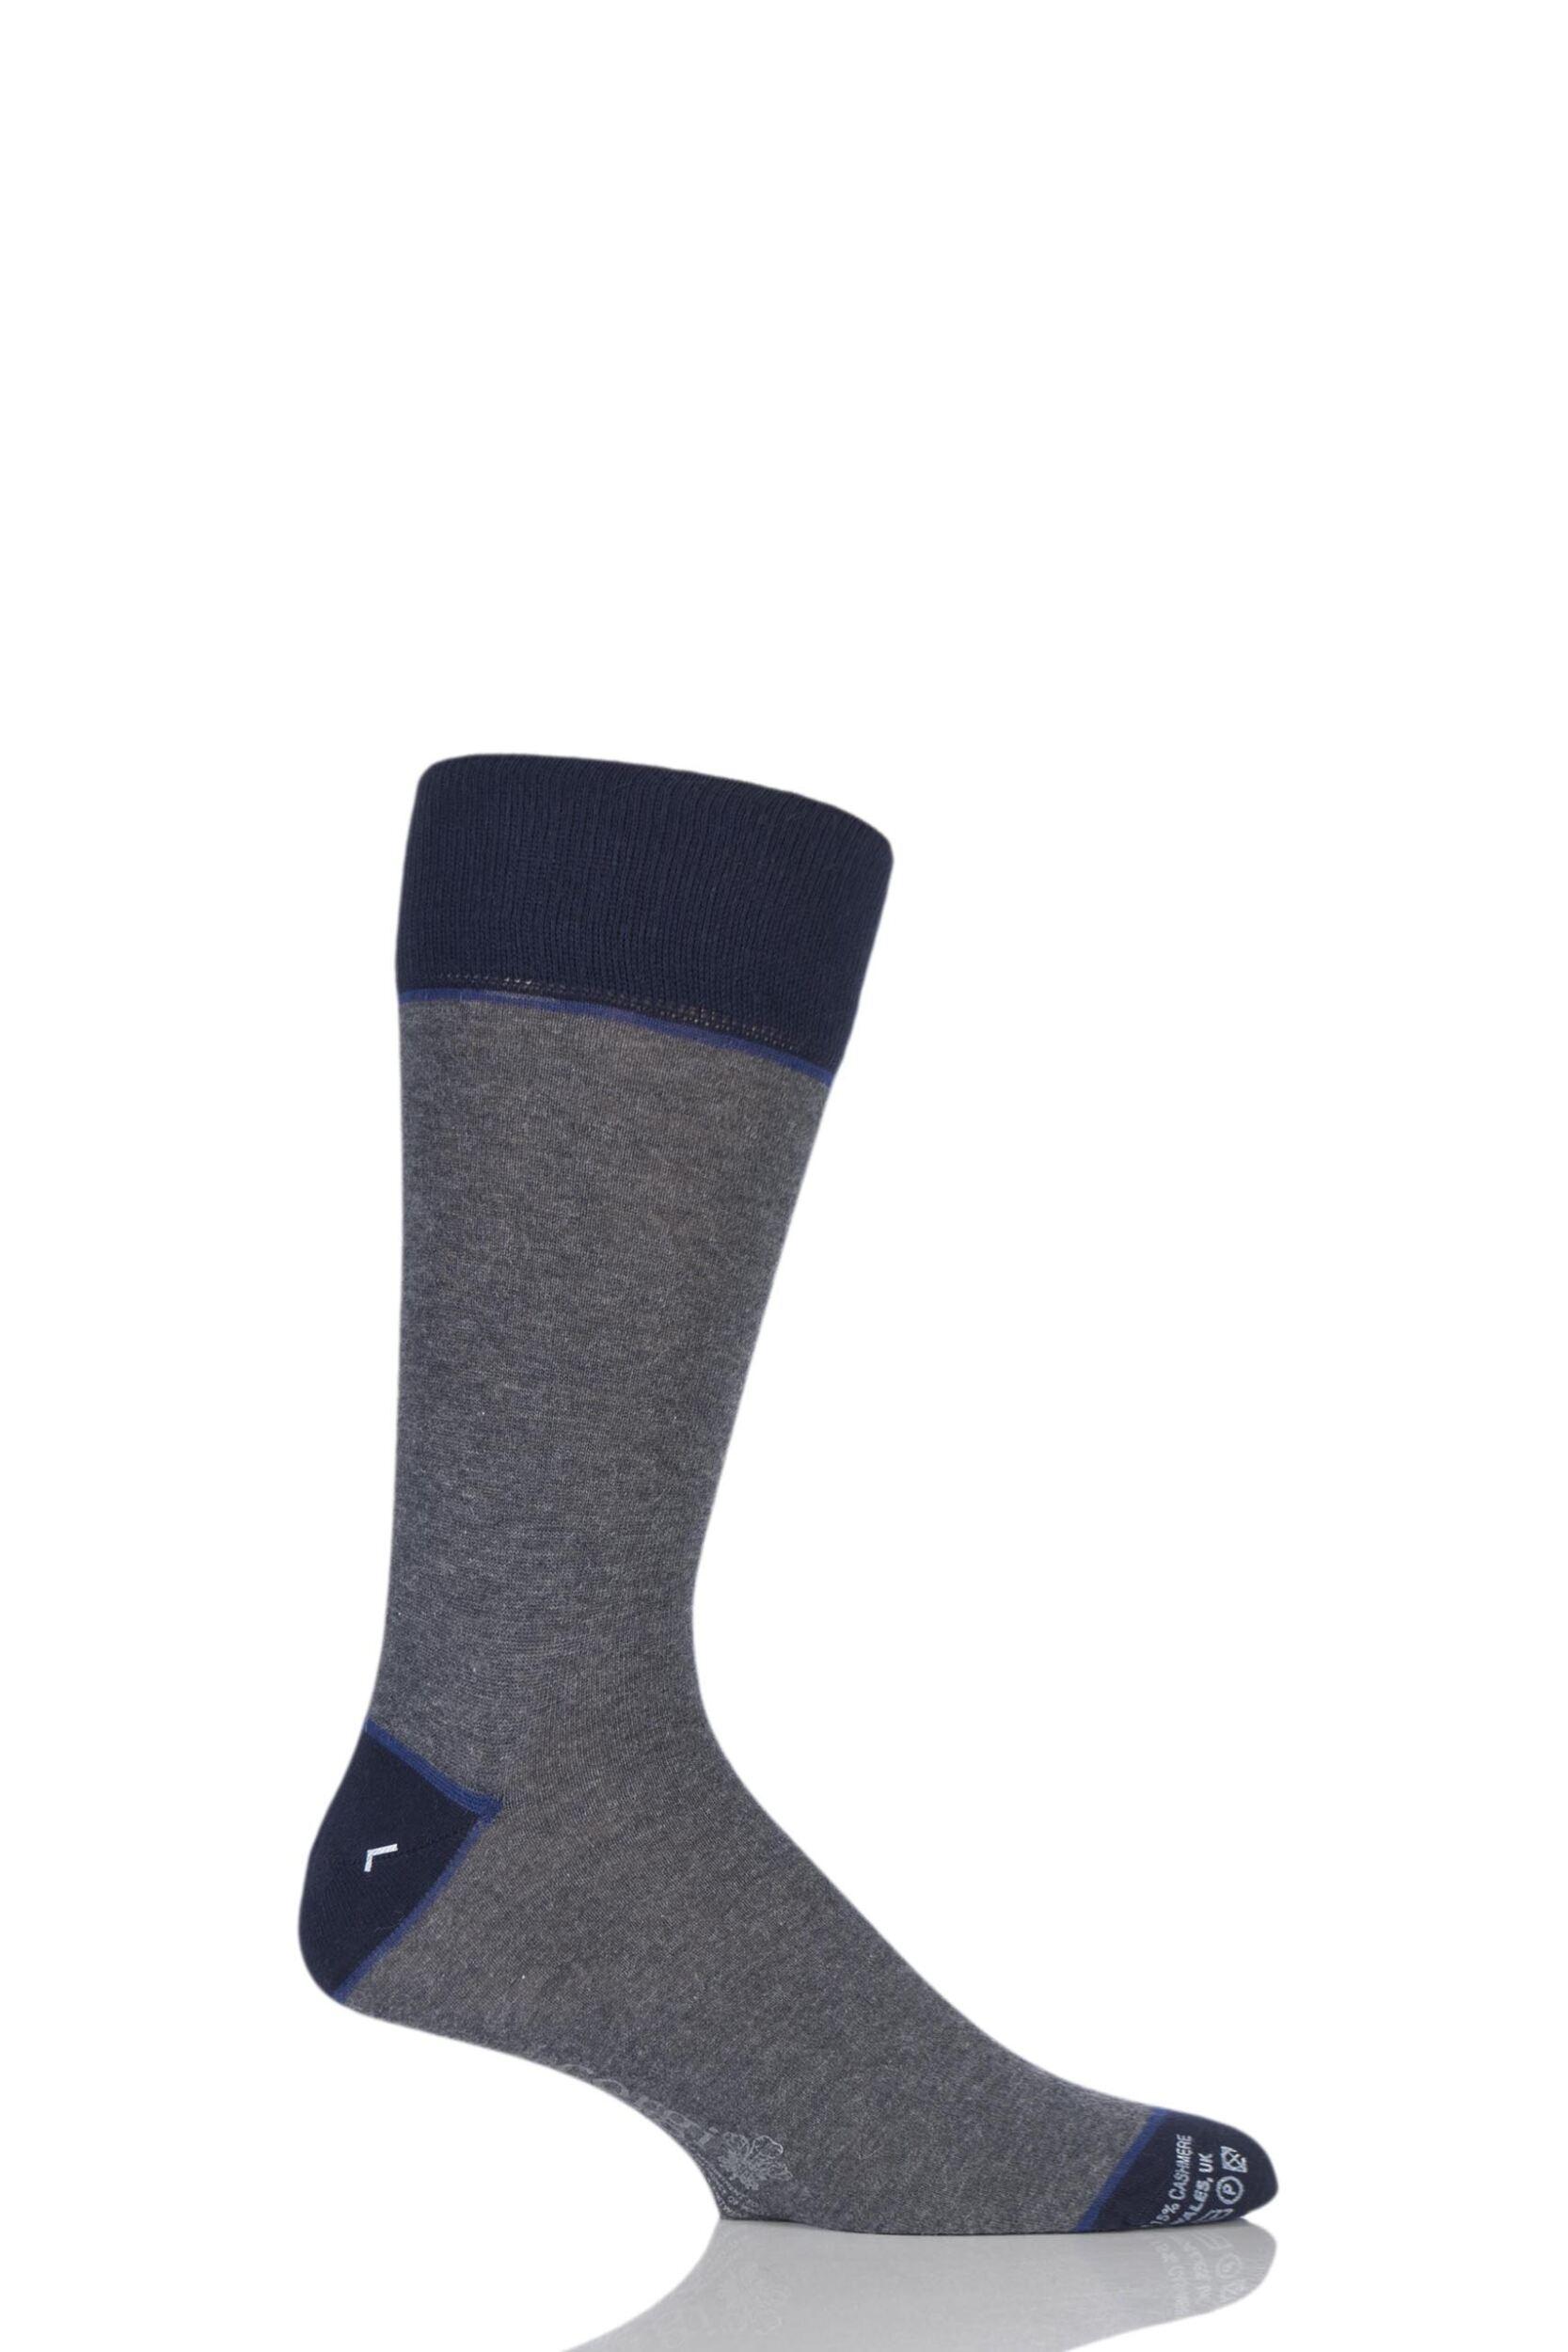 Mens 1 Pair Corgi Lightweight Cashmere Blend Contrast Heel, Toe and Welt Socks